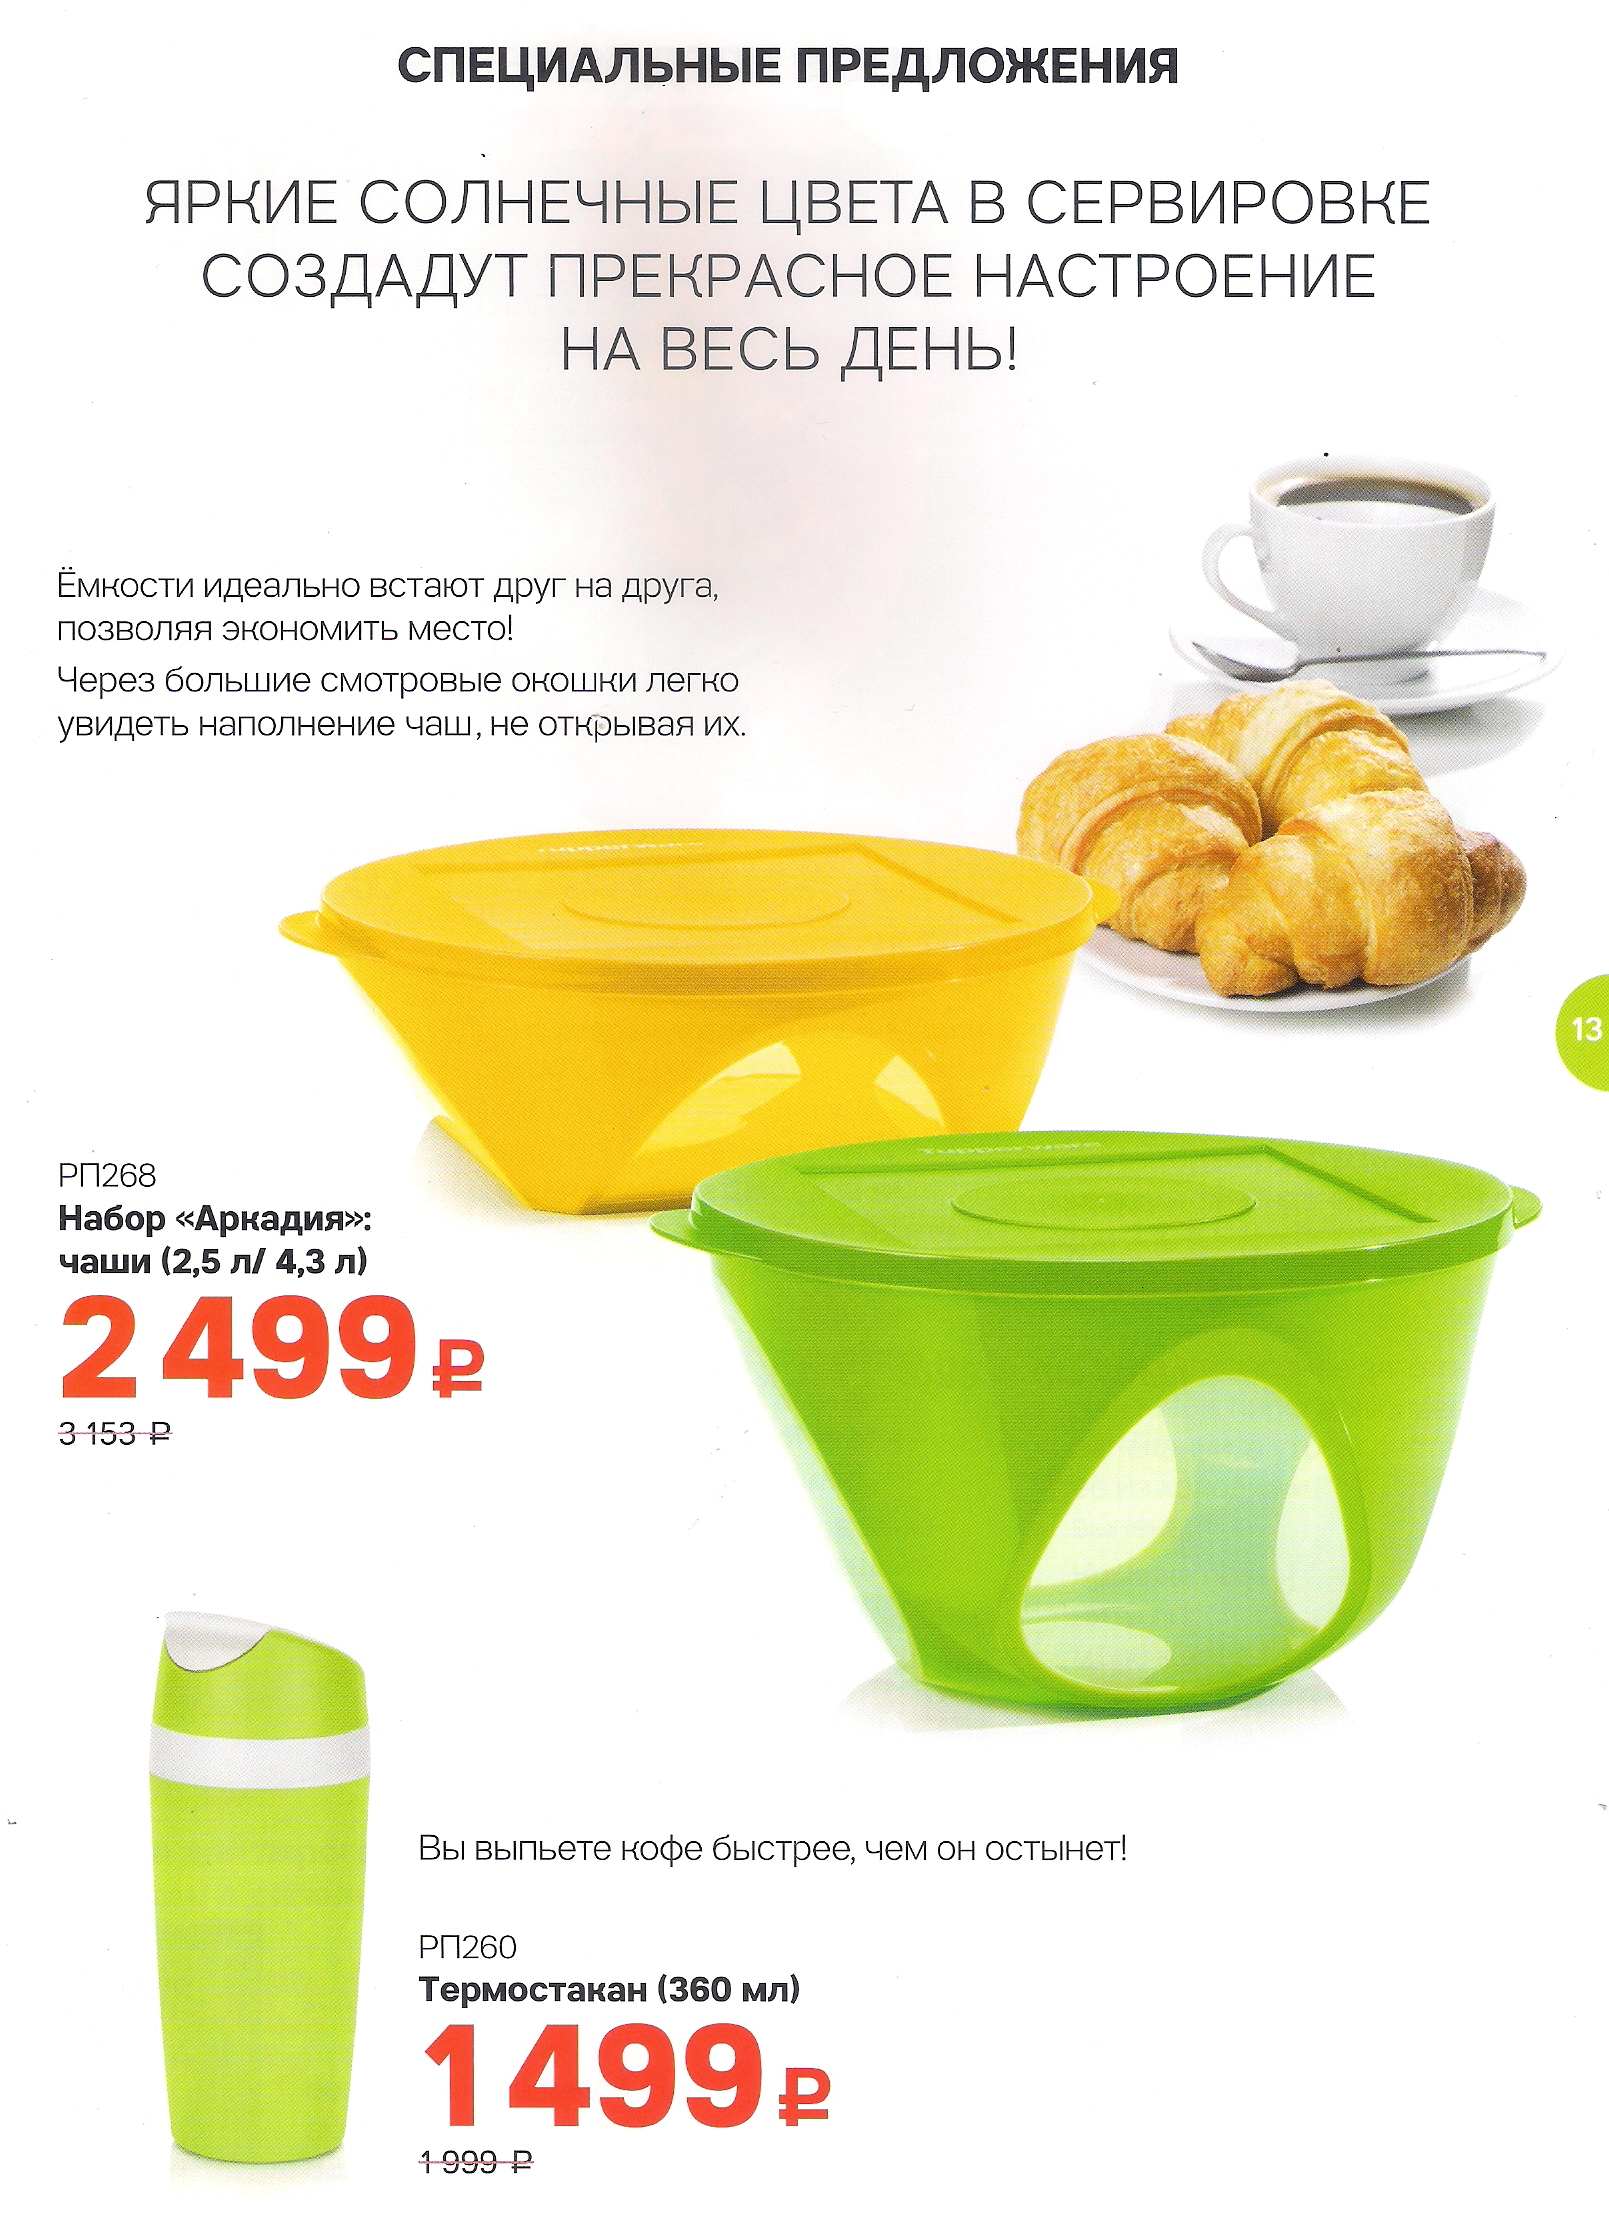 https://tupperware-online.ru/images/upload/12о.jpg